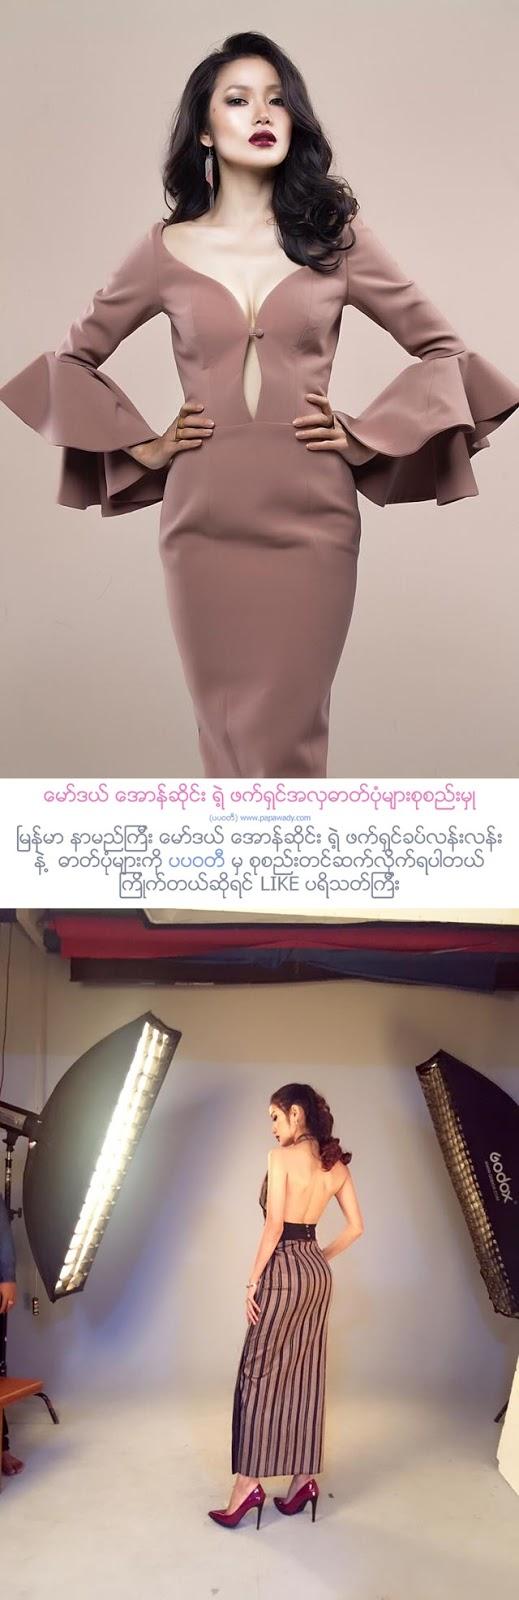 Myanmar Model Awn Seng Activities Photos in September : Studio Photoshoot  and Stunning Fashion